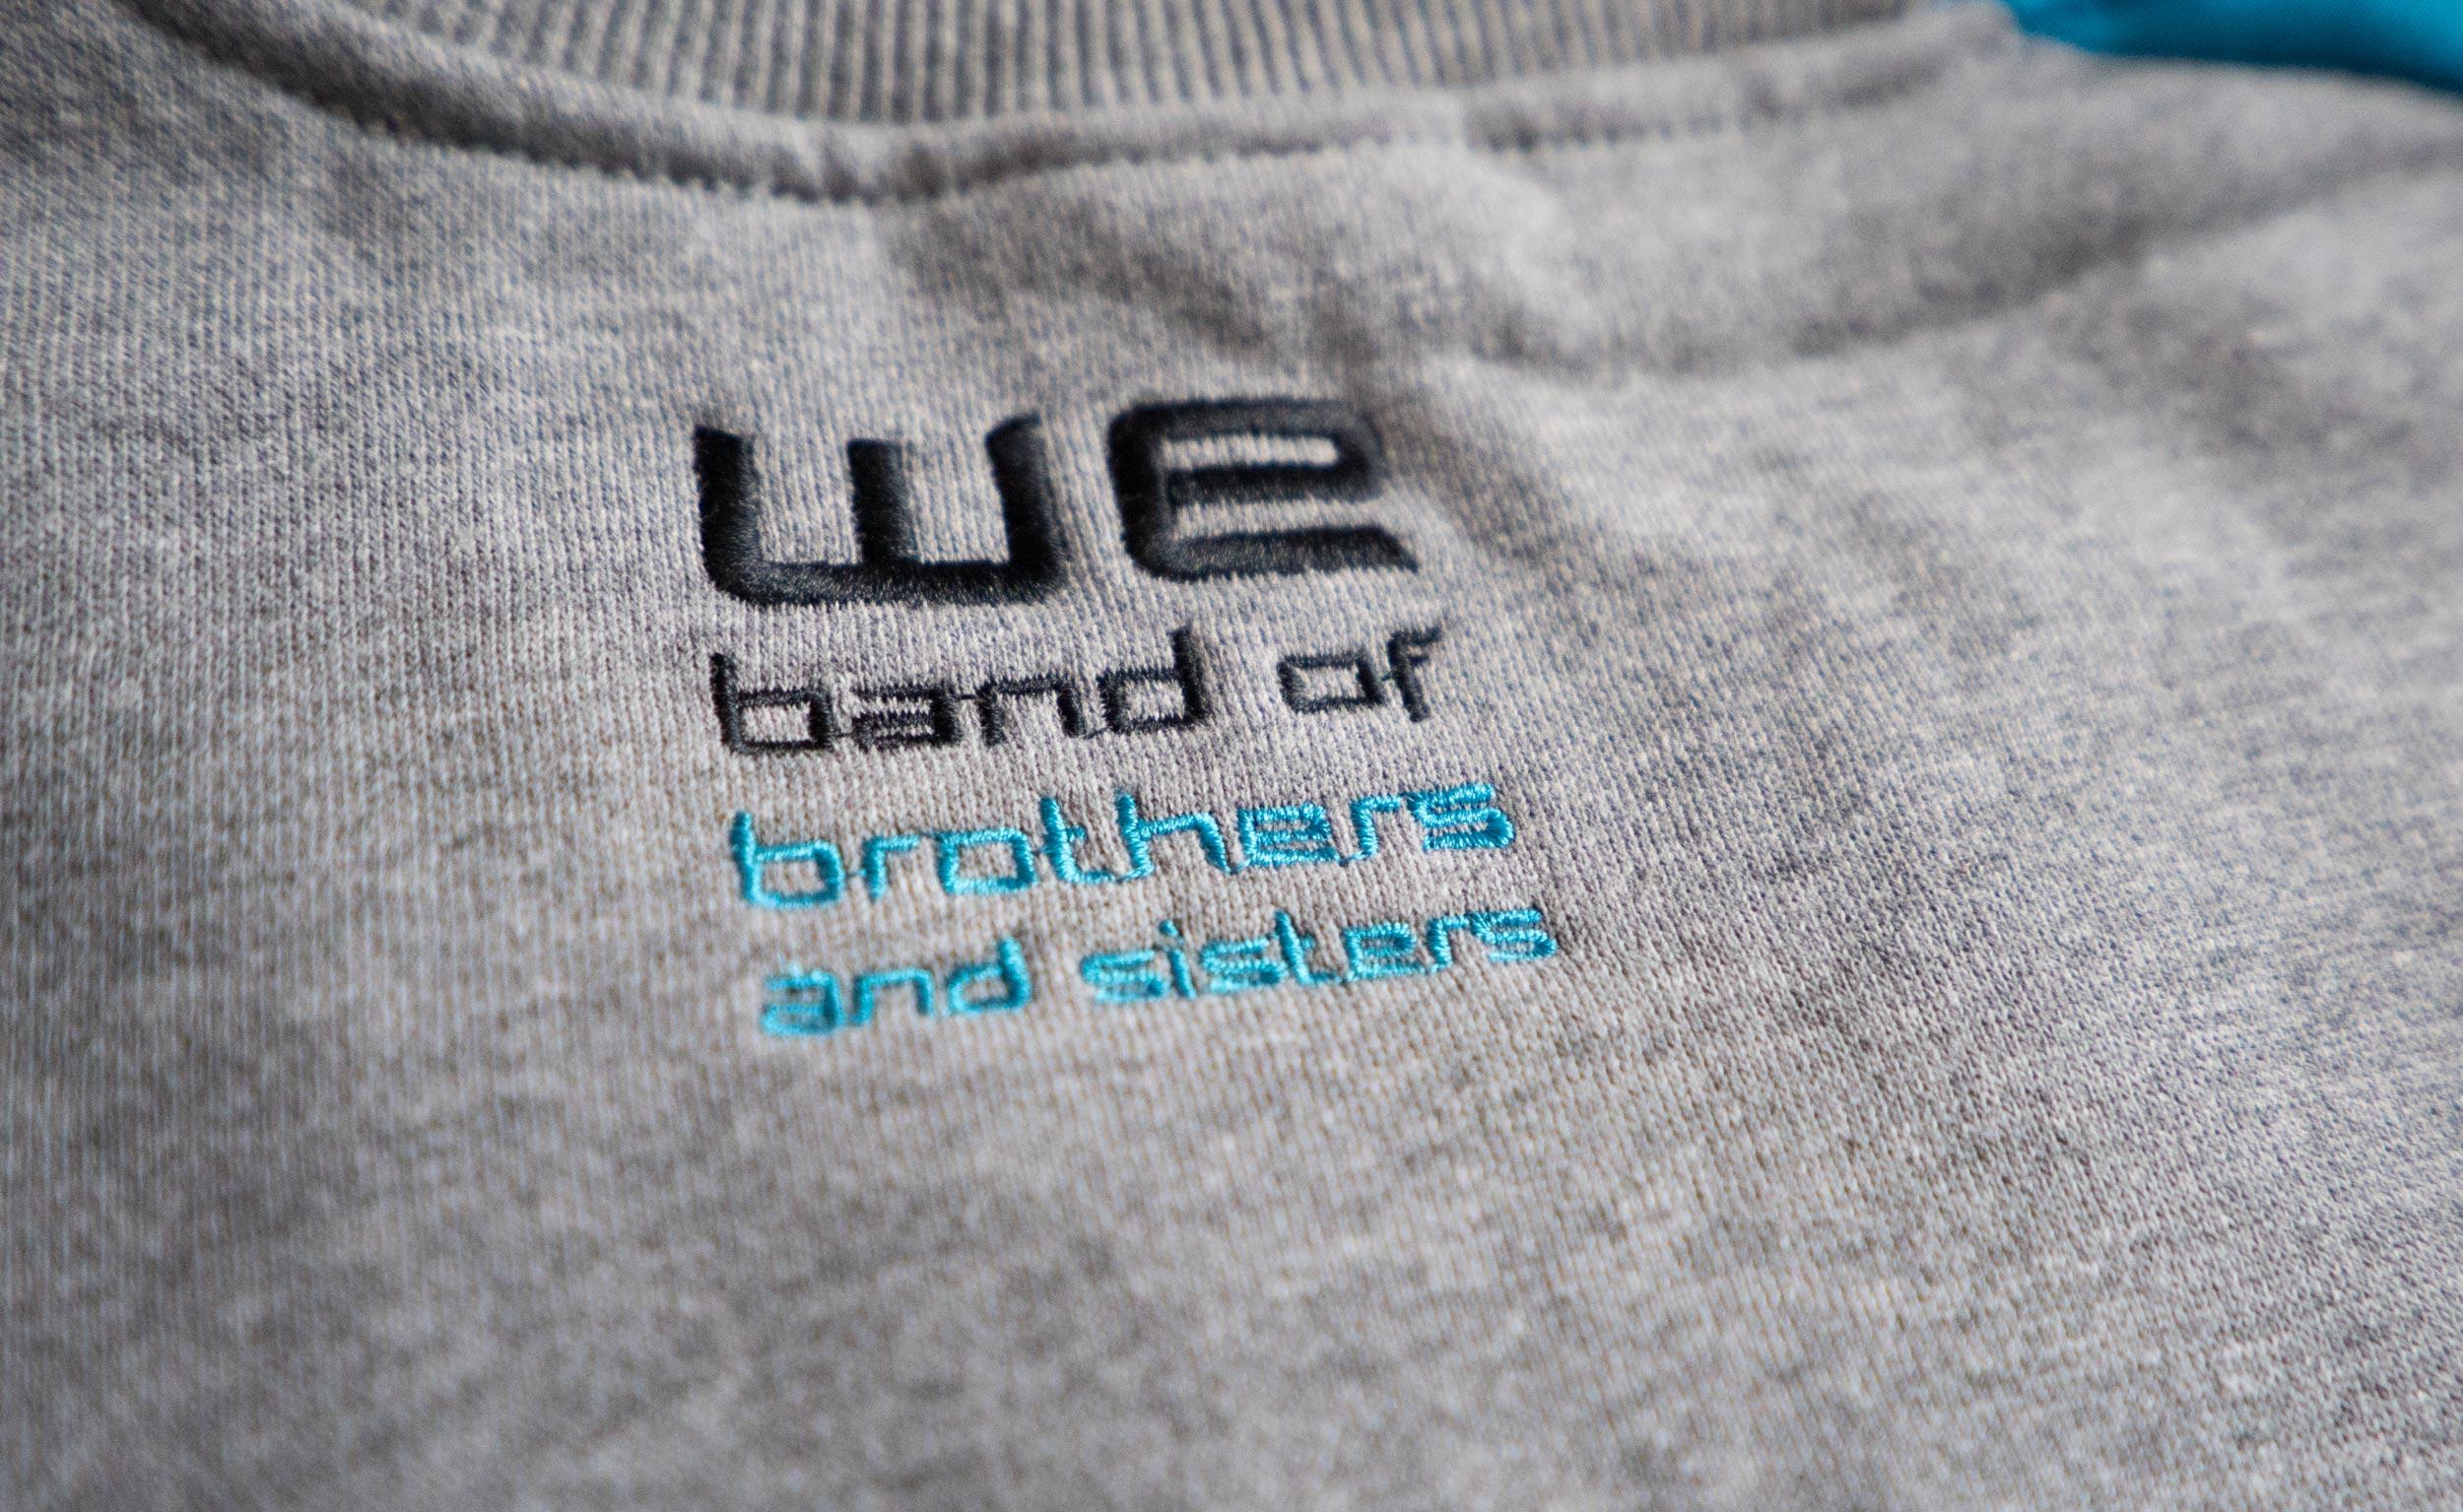 Wefew-clothing_Parkour-Freerunning_Tshirts_94_Sweater GrHEY